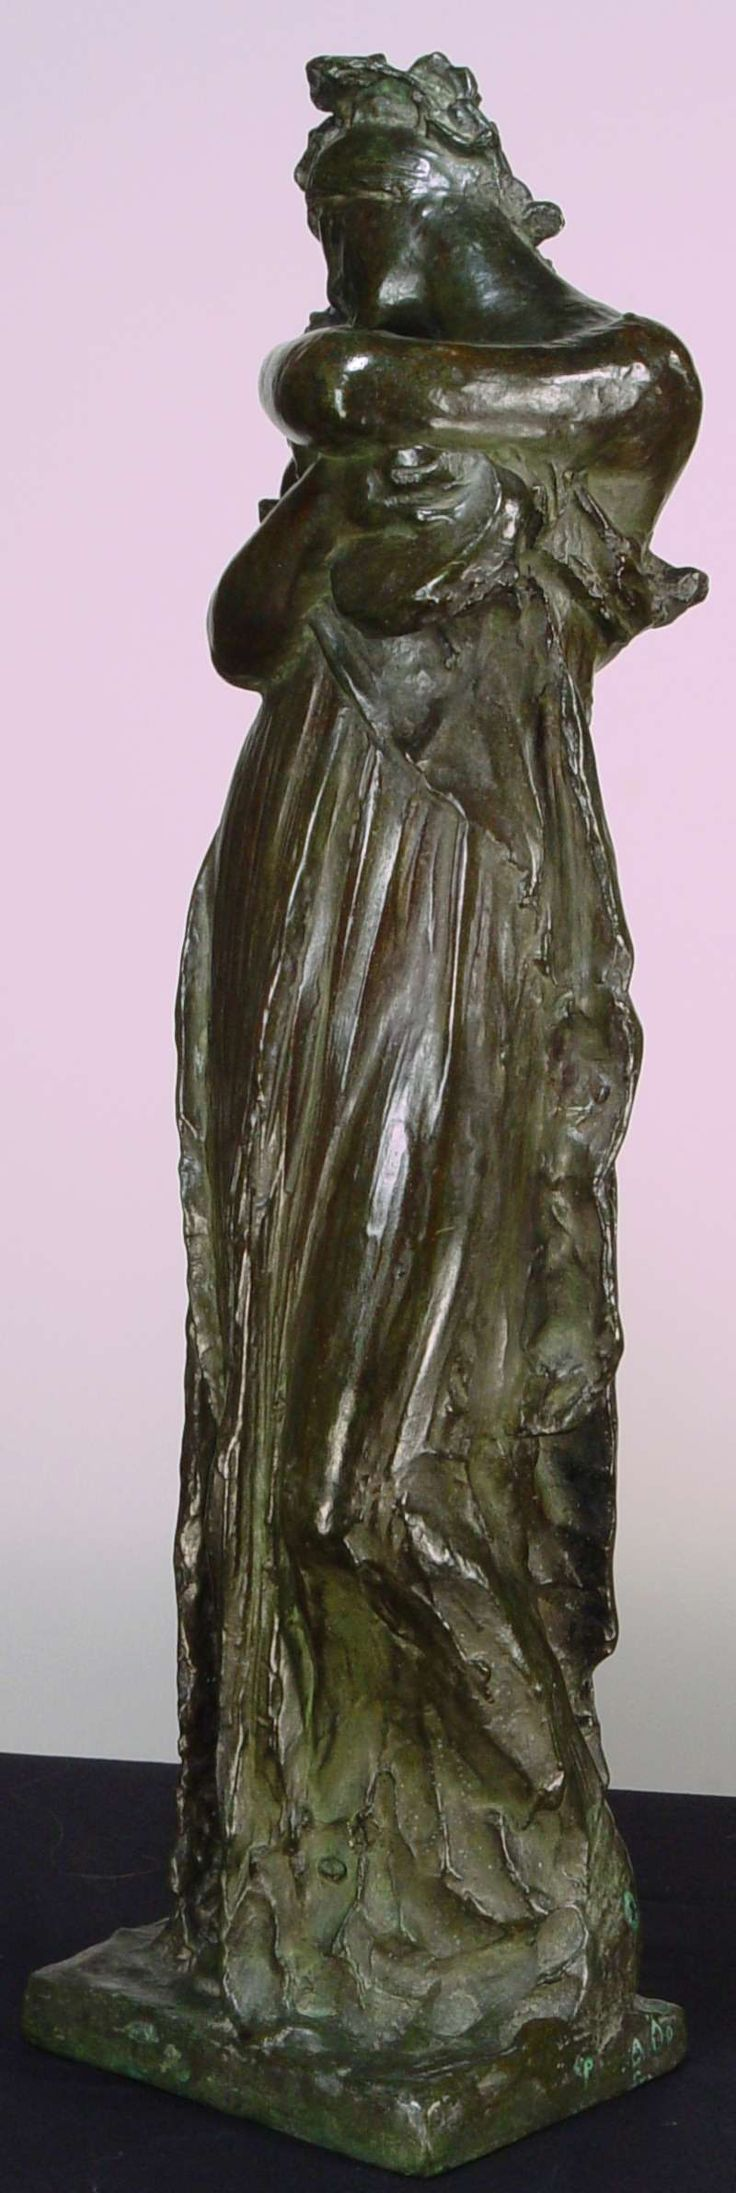 "Josef Vaclav Myslbek (Czech 1828-1922) ""Music 4th Draft"" Bronze. Early ..."